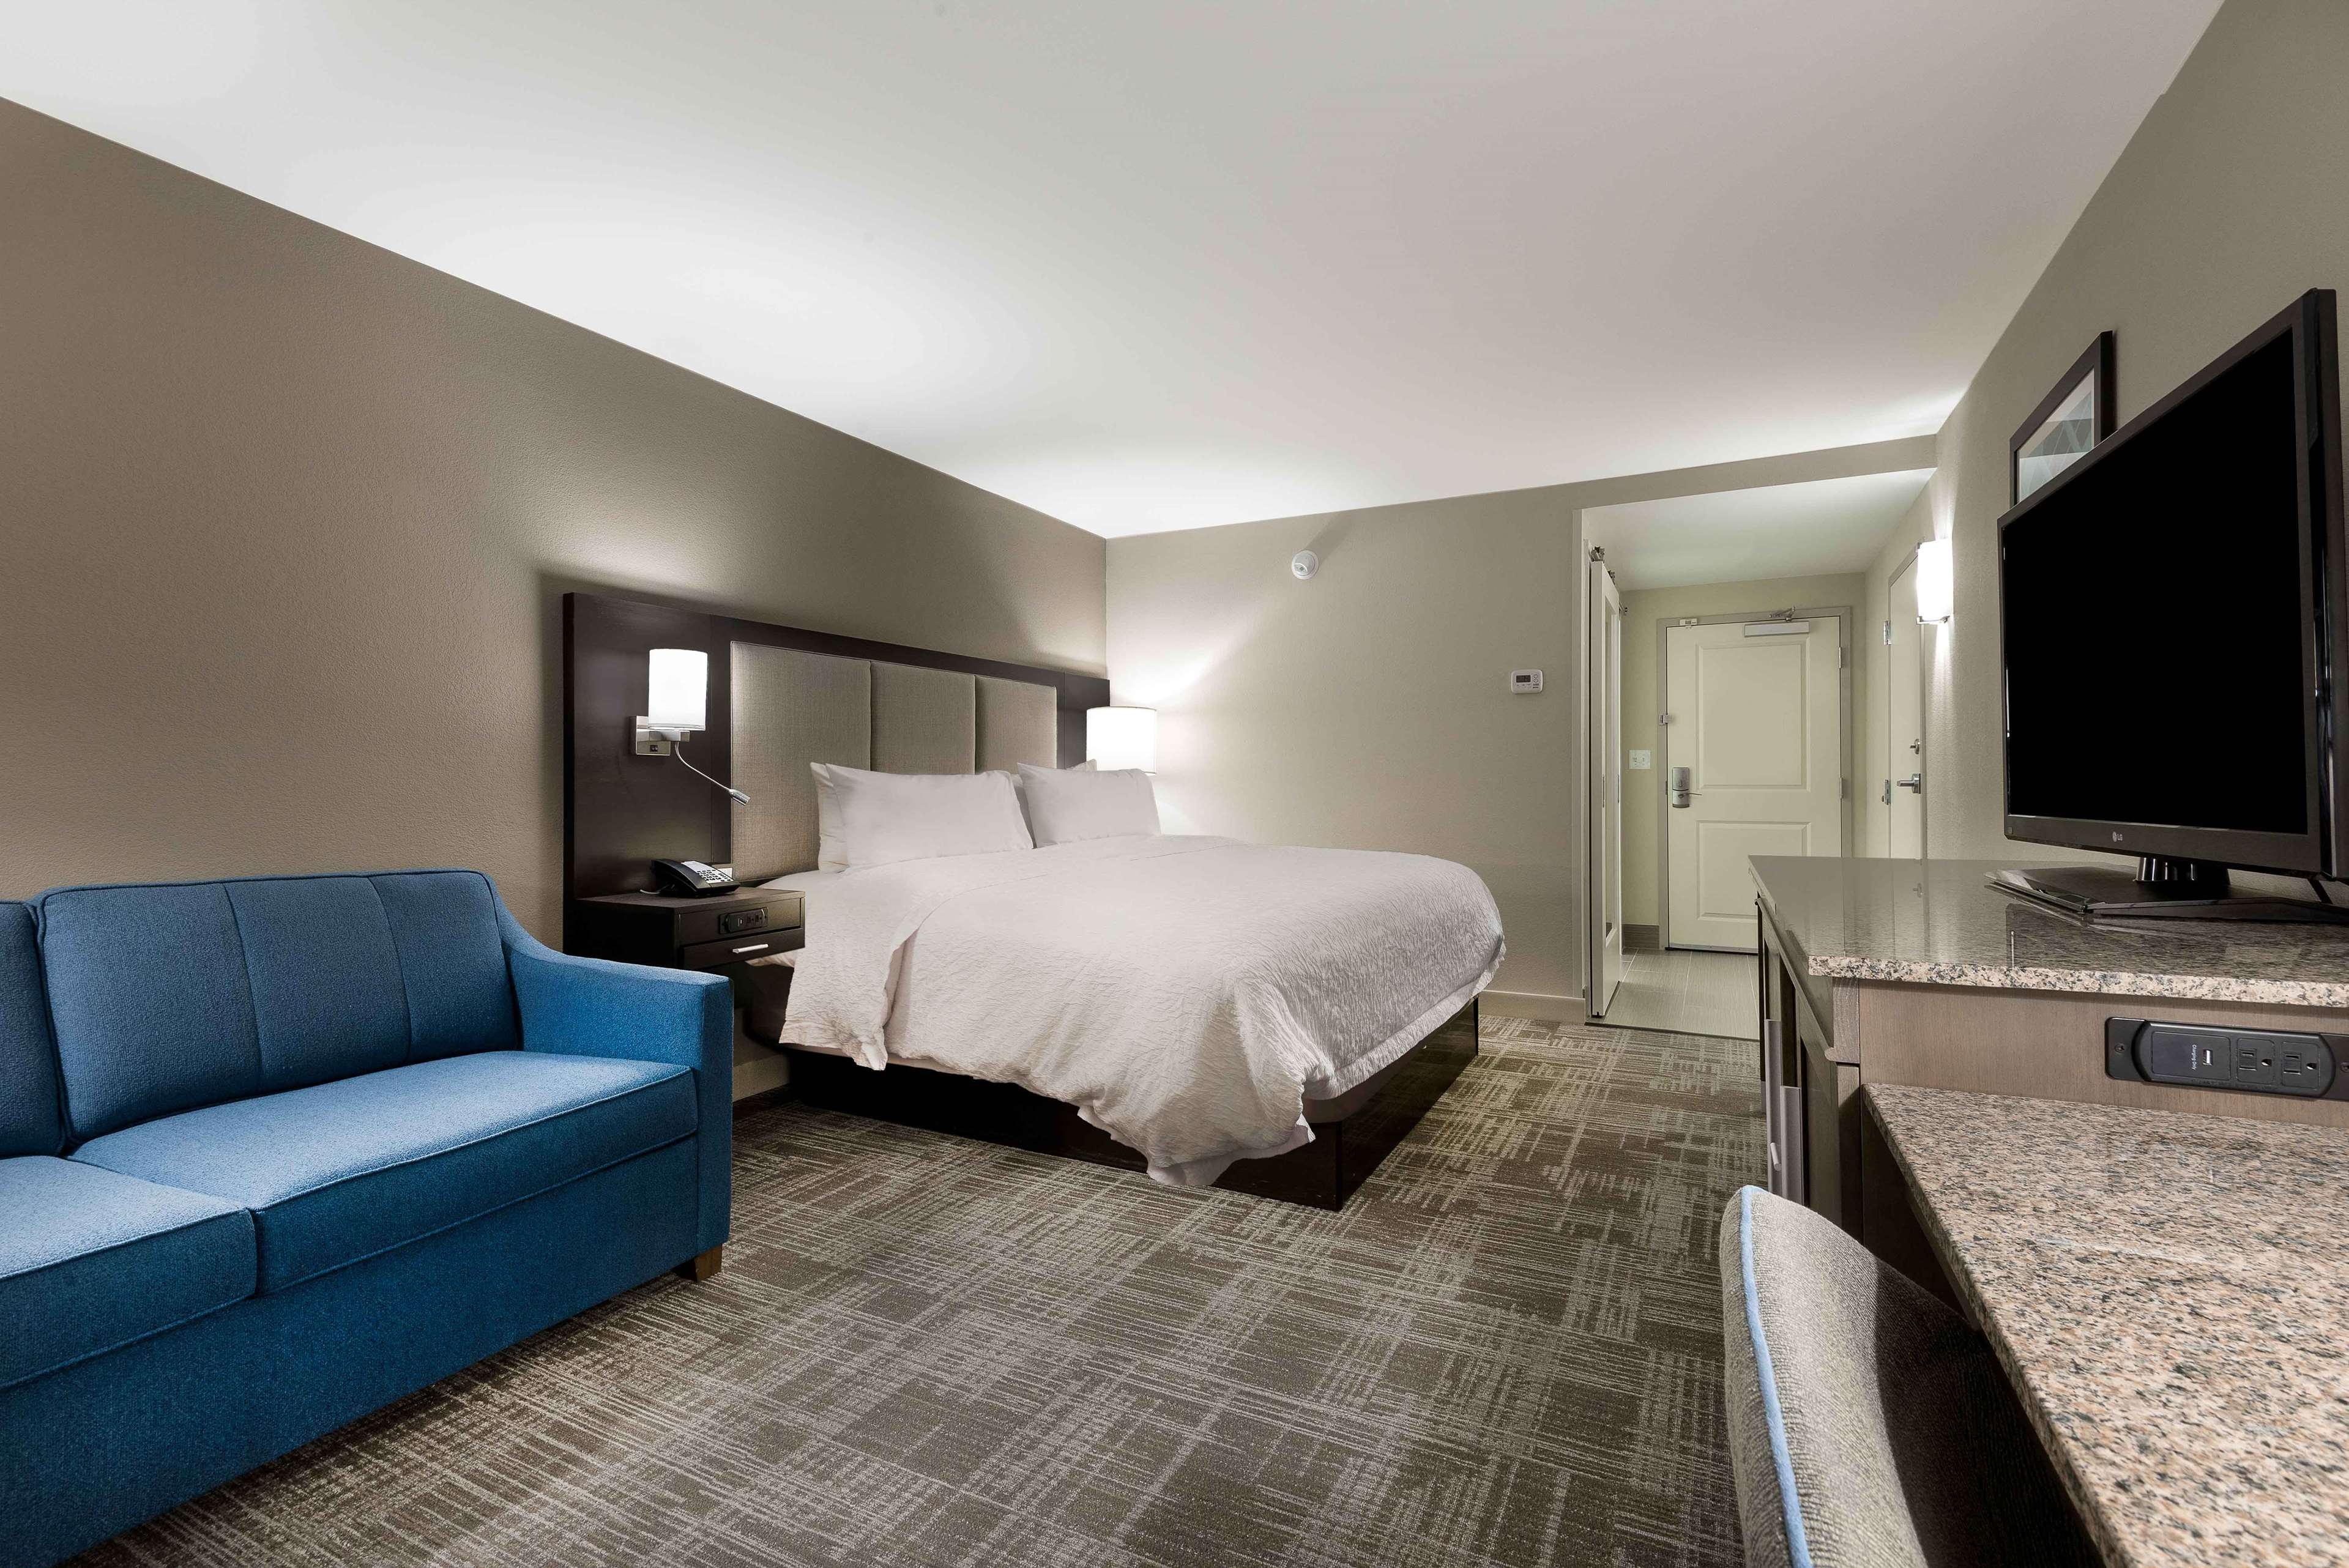 Hampton Inn & Suites Chapel Hill/Durham, Area image 11